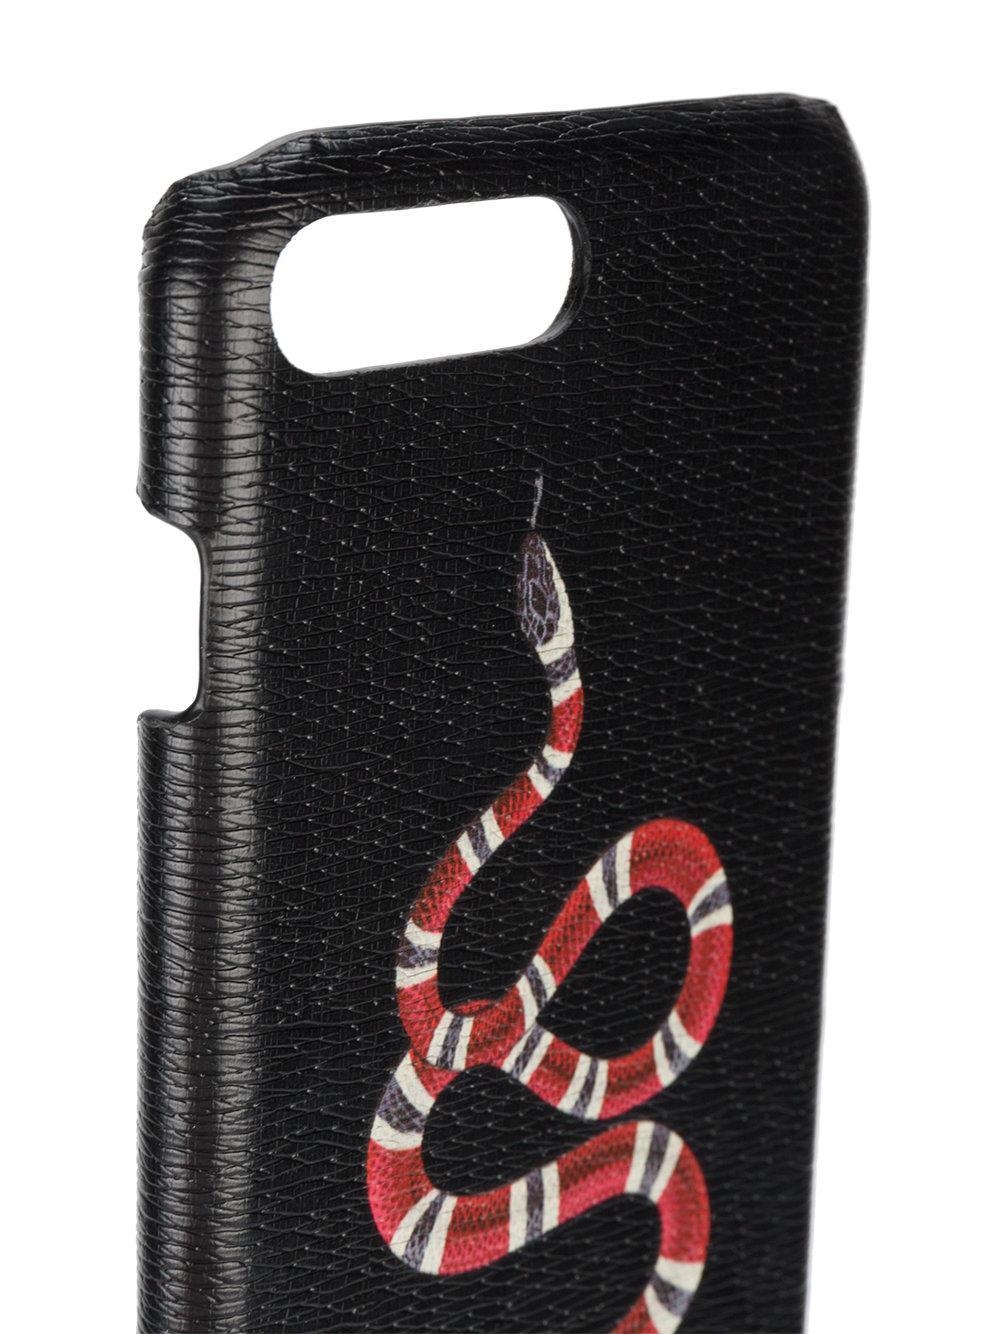 Bottega Veneta Iphone  Plus Case